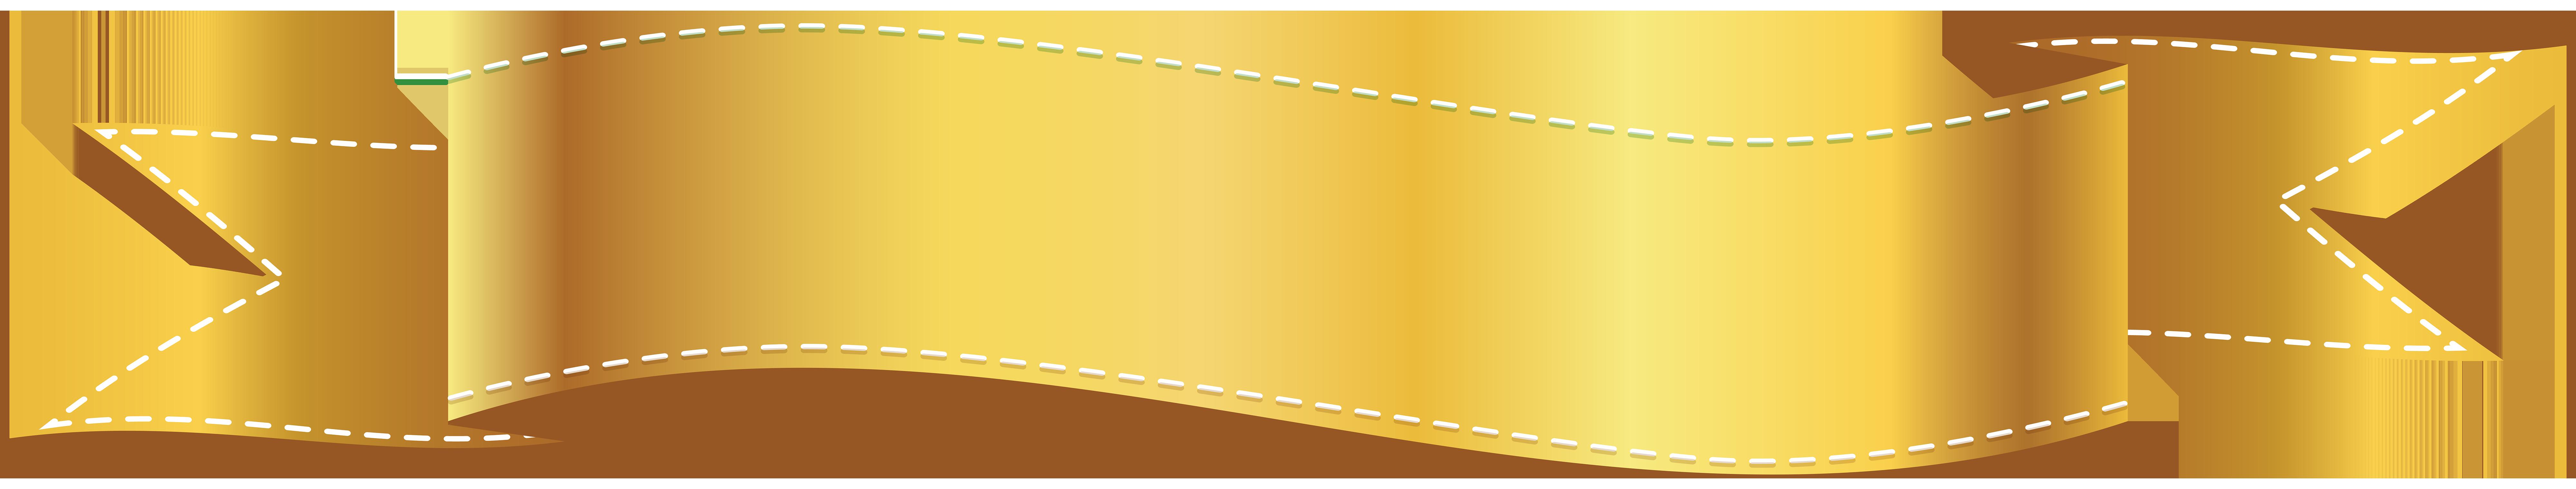 Golden Banner PNG Clip Art Image | wall backgrounds & decorative ...